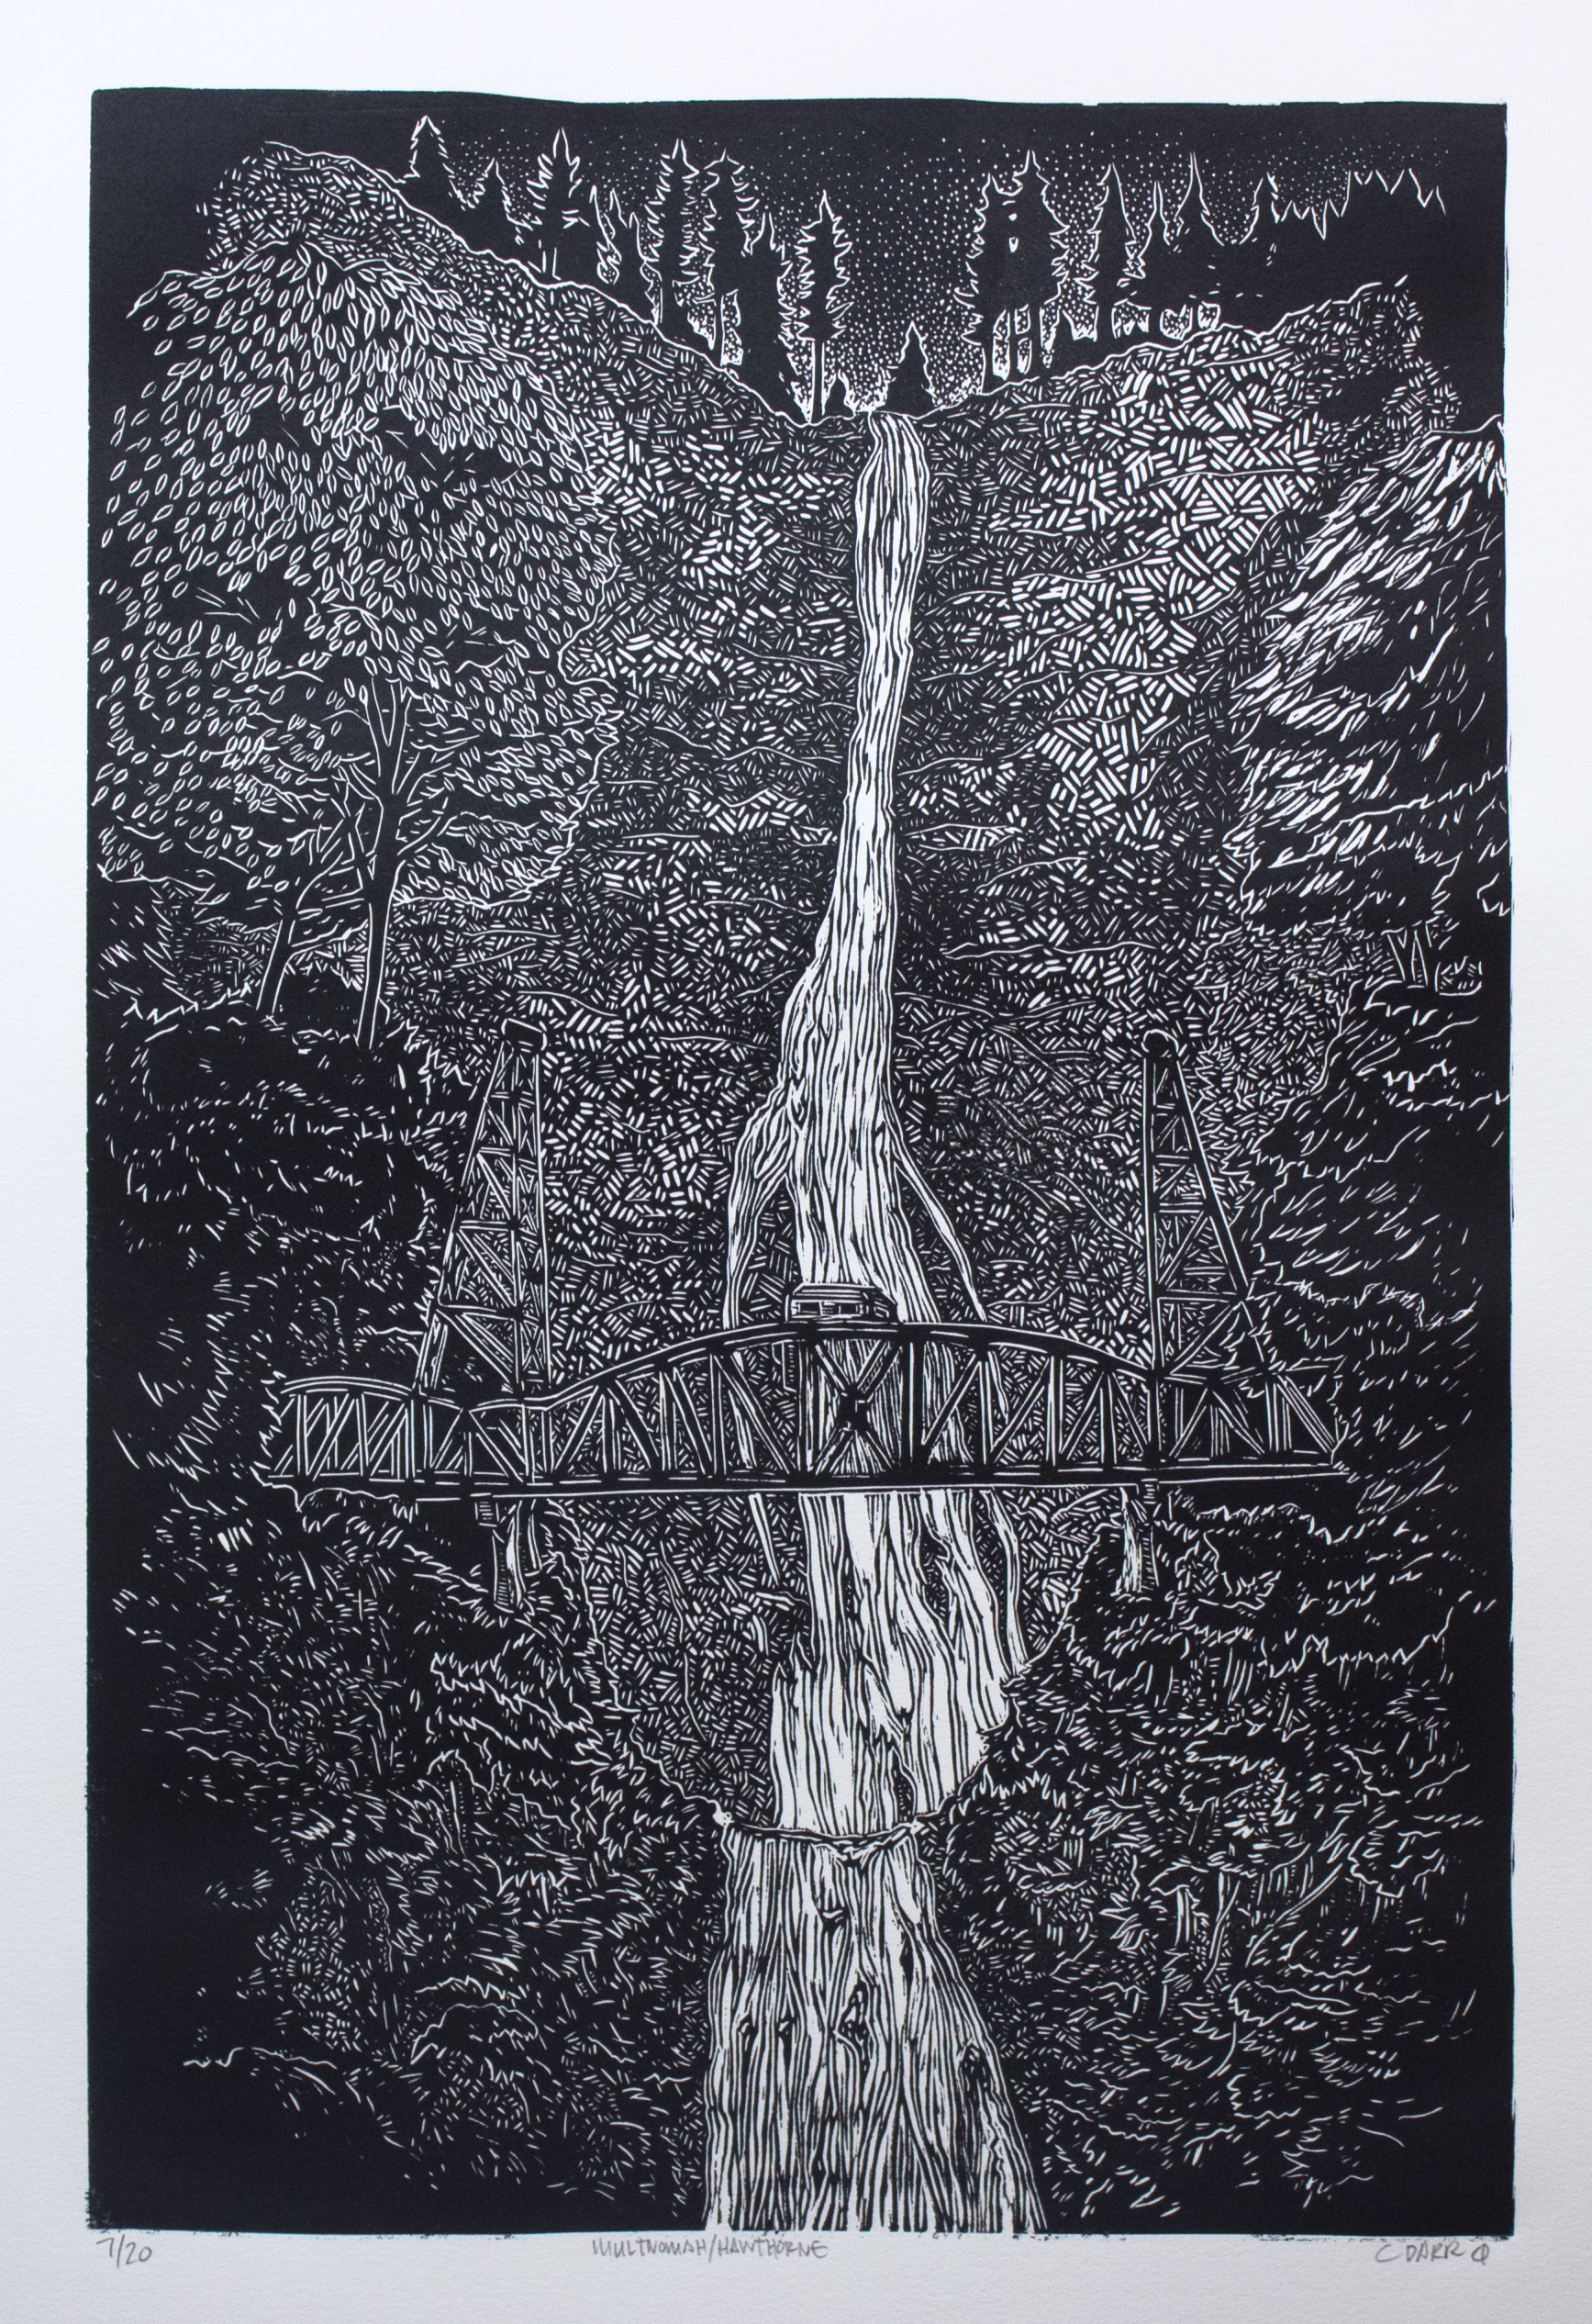 Multnomah / Hawthorne  linocut print